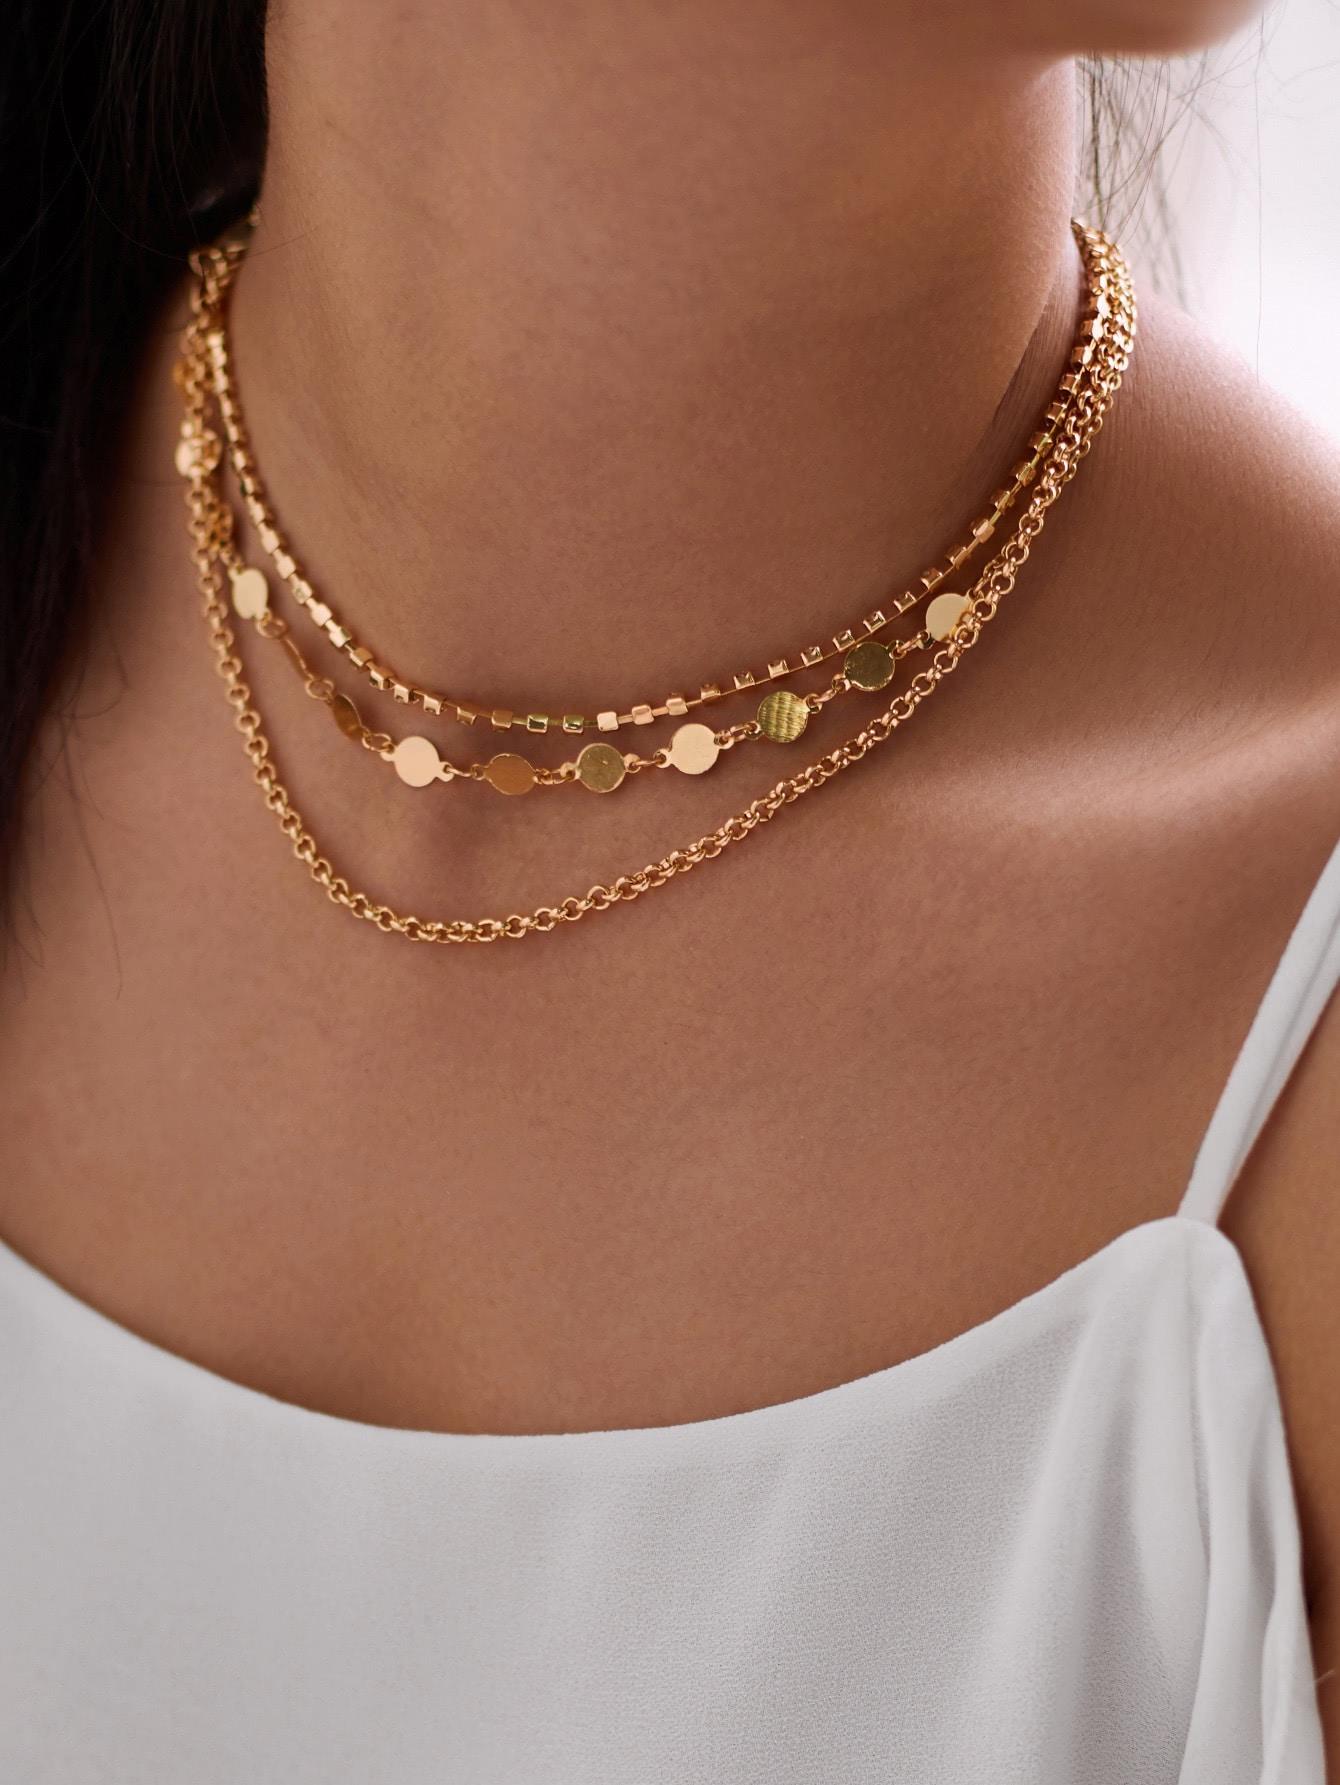 Rhinestone & Beaded Design Layered Necklace